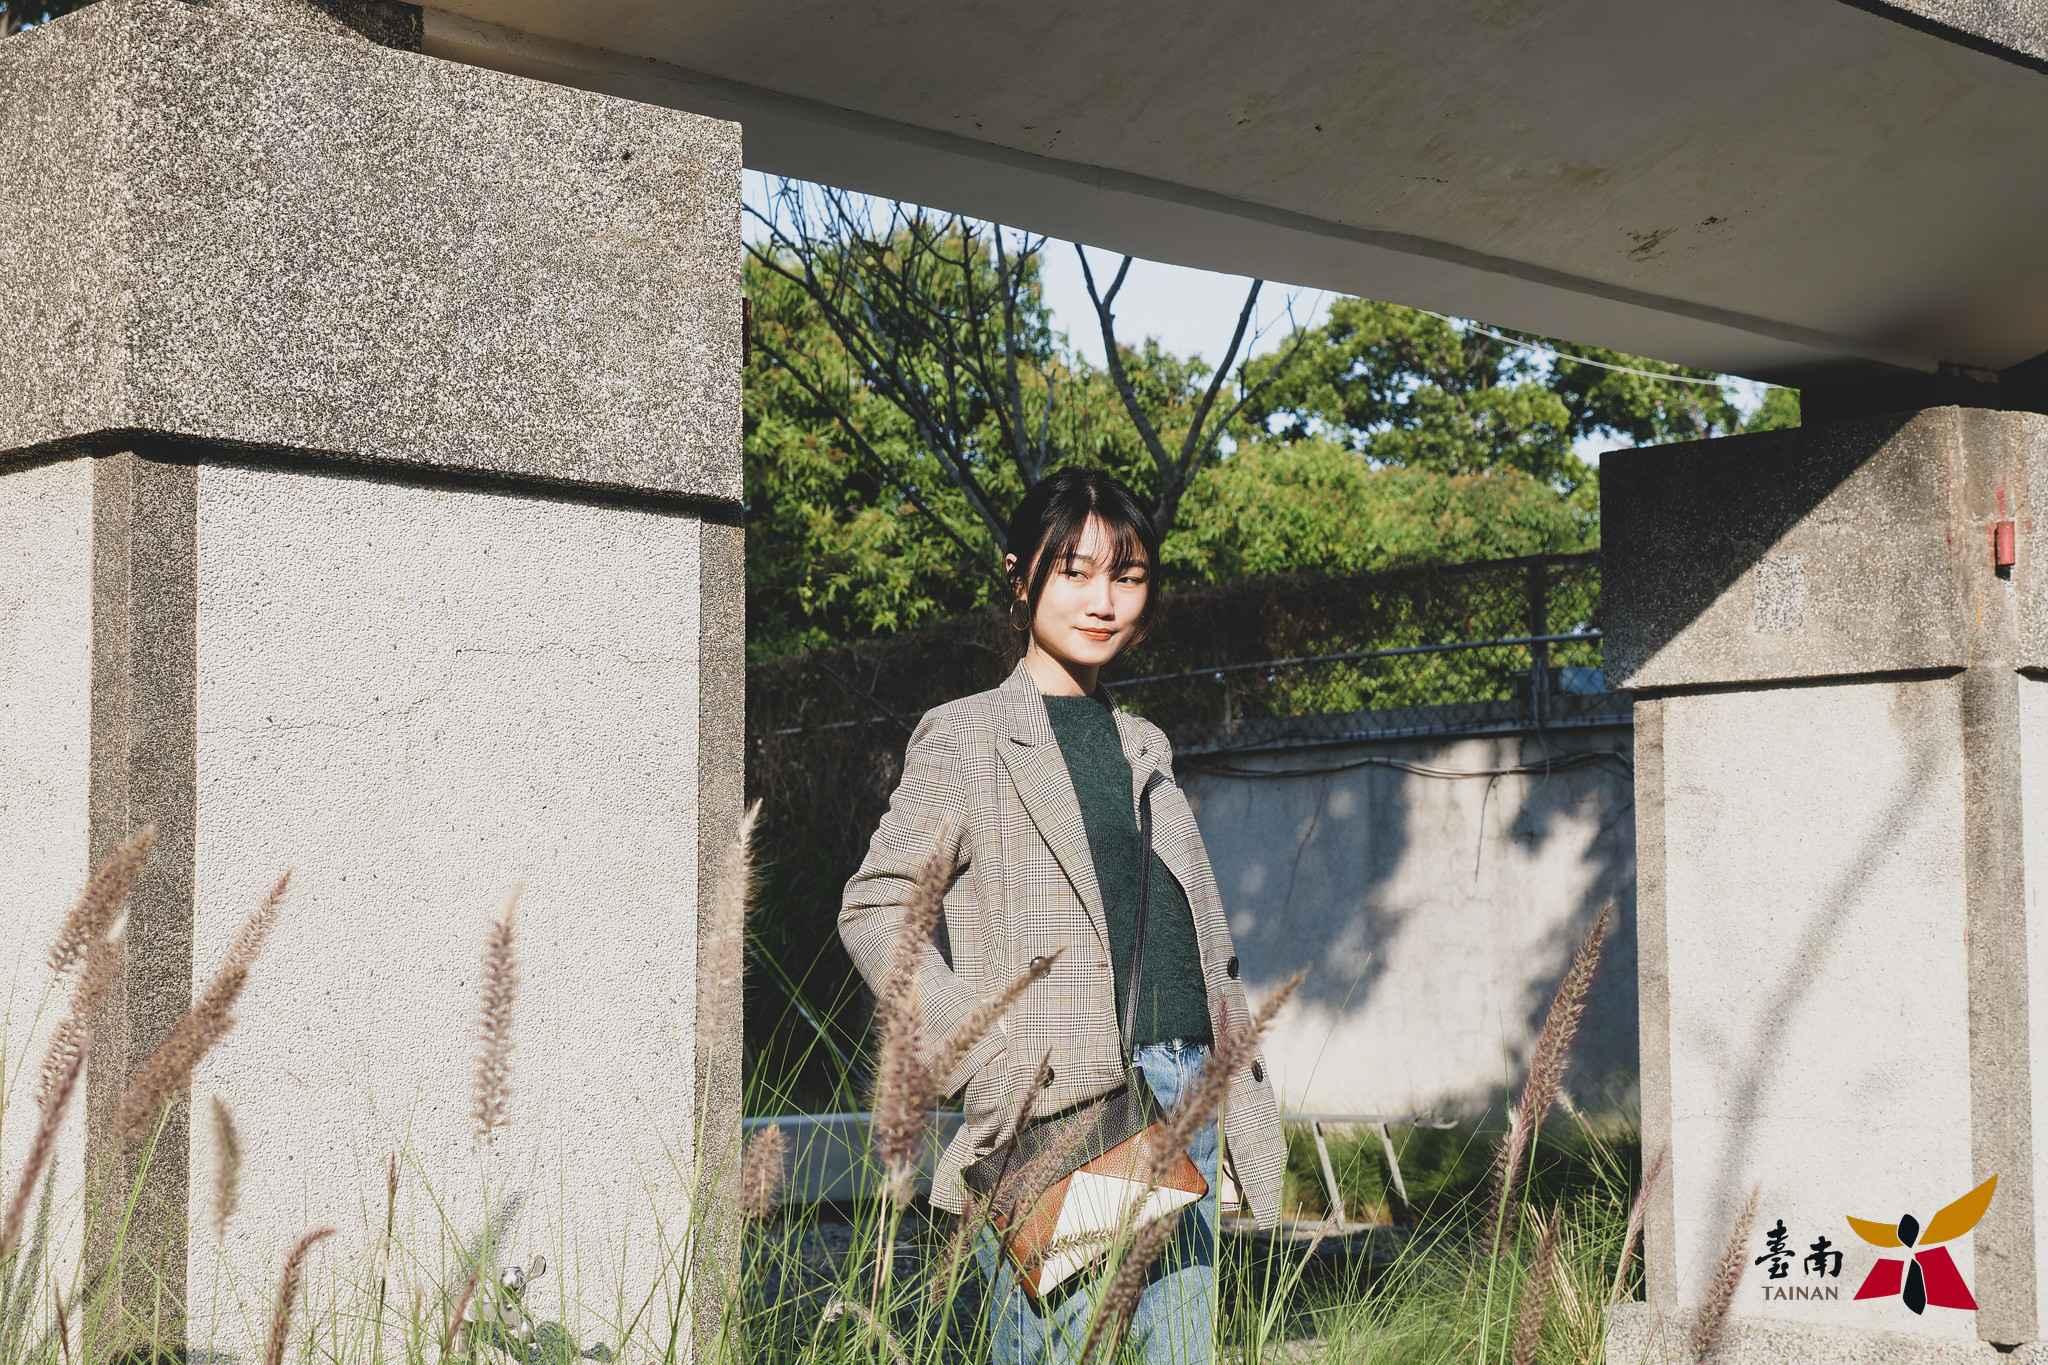 台南拍照景點-Mytainan - 01